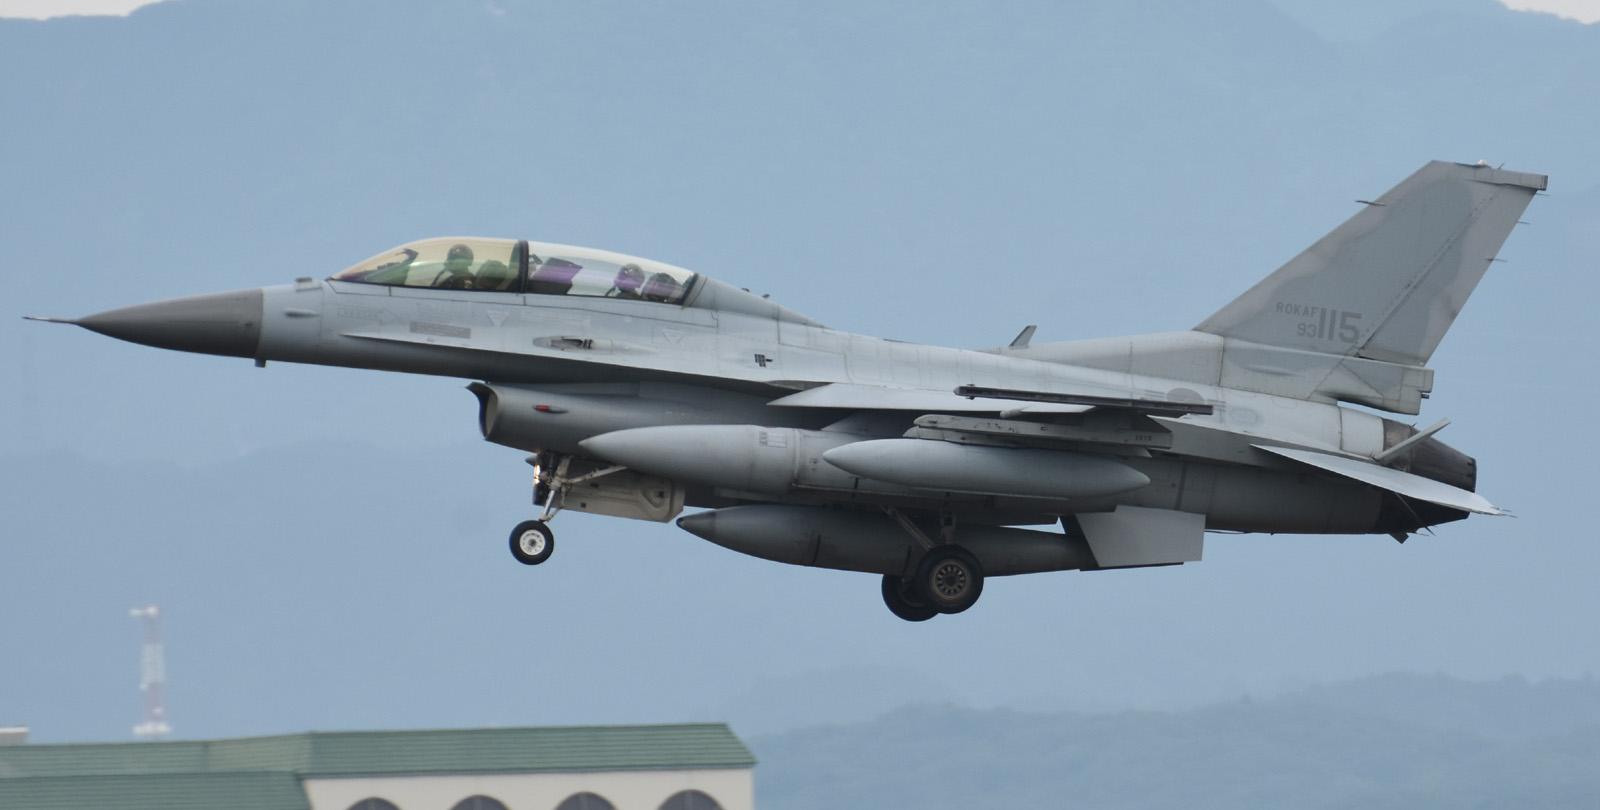 F16d170601g496